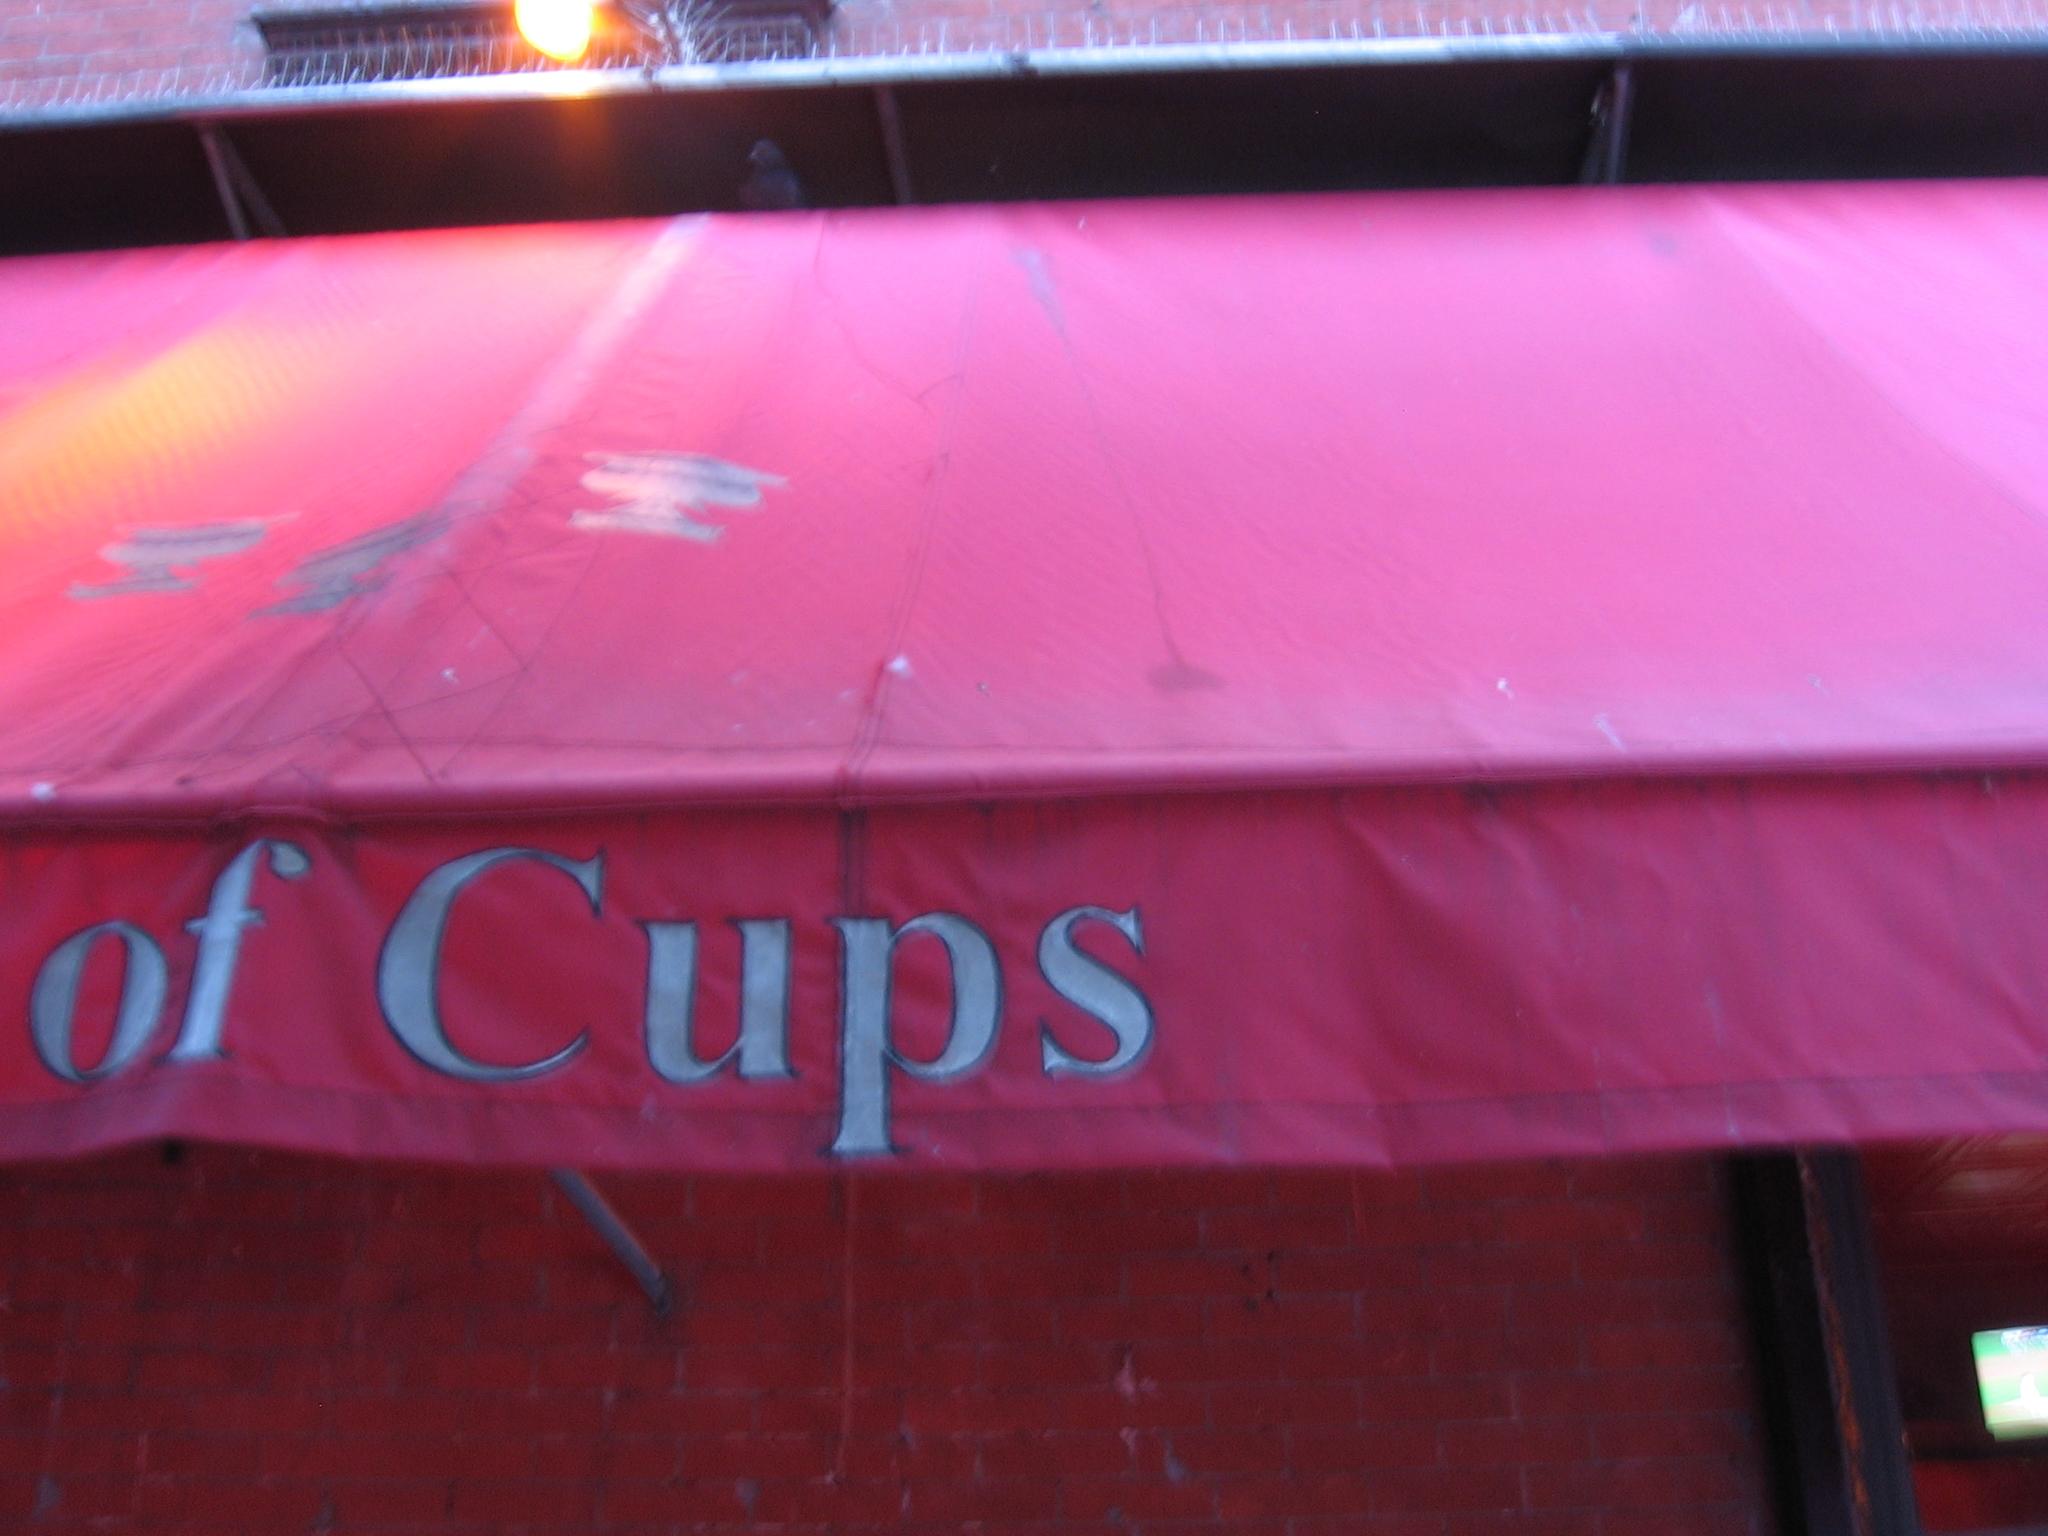 cups sign.JPG